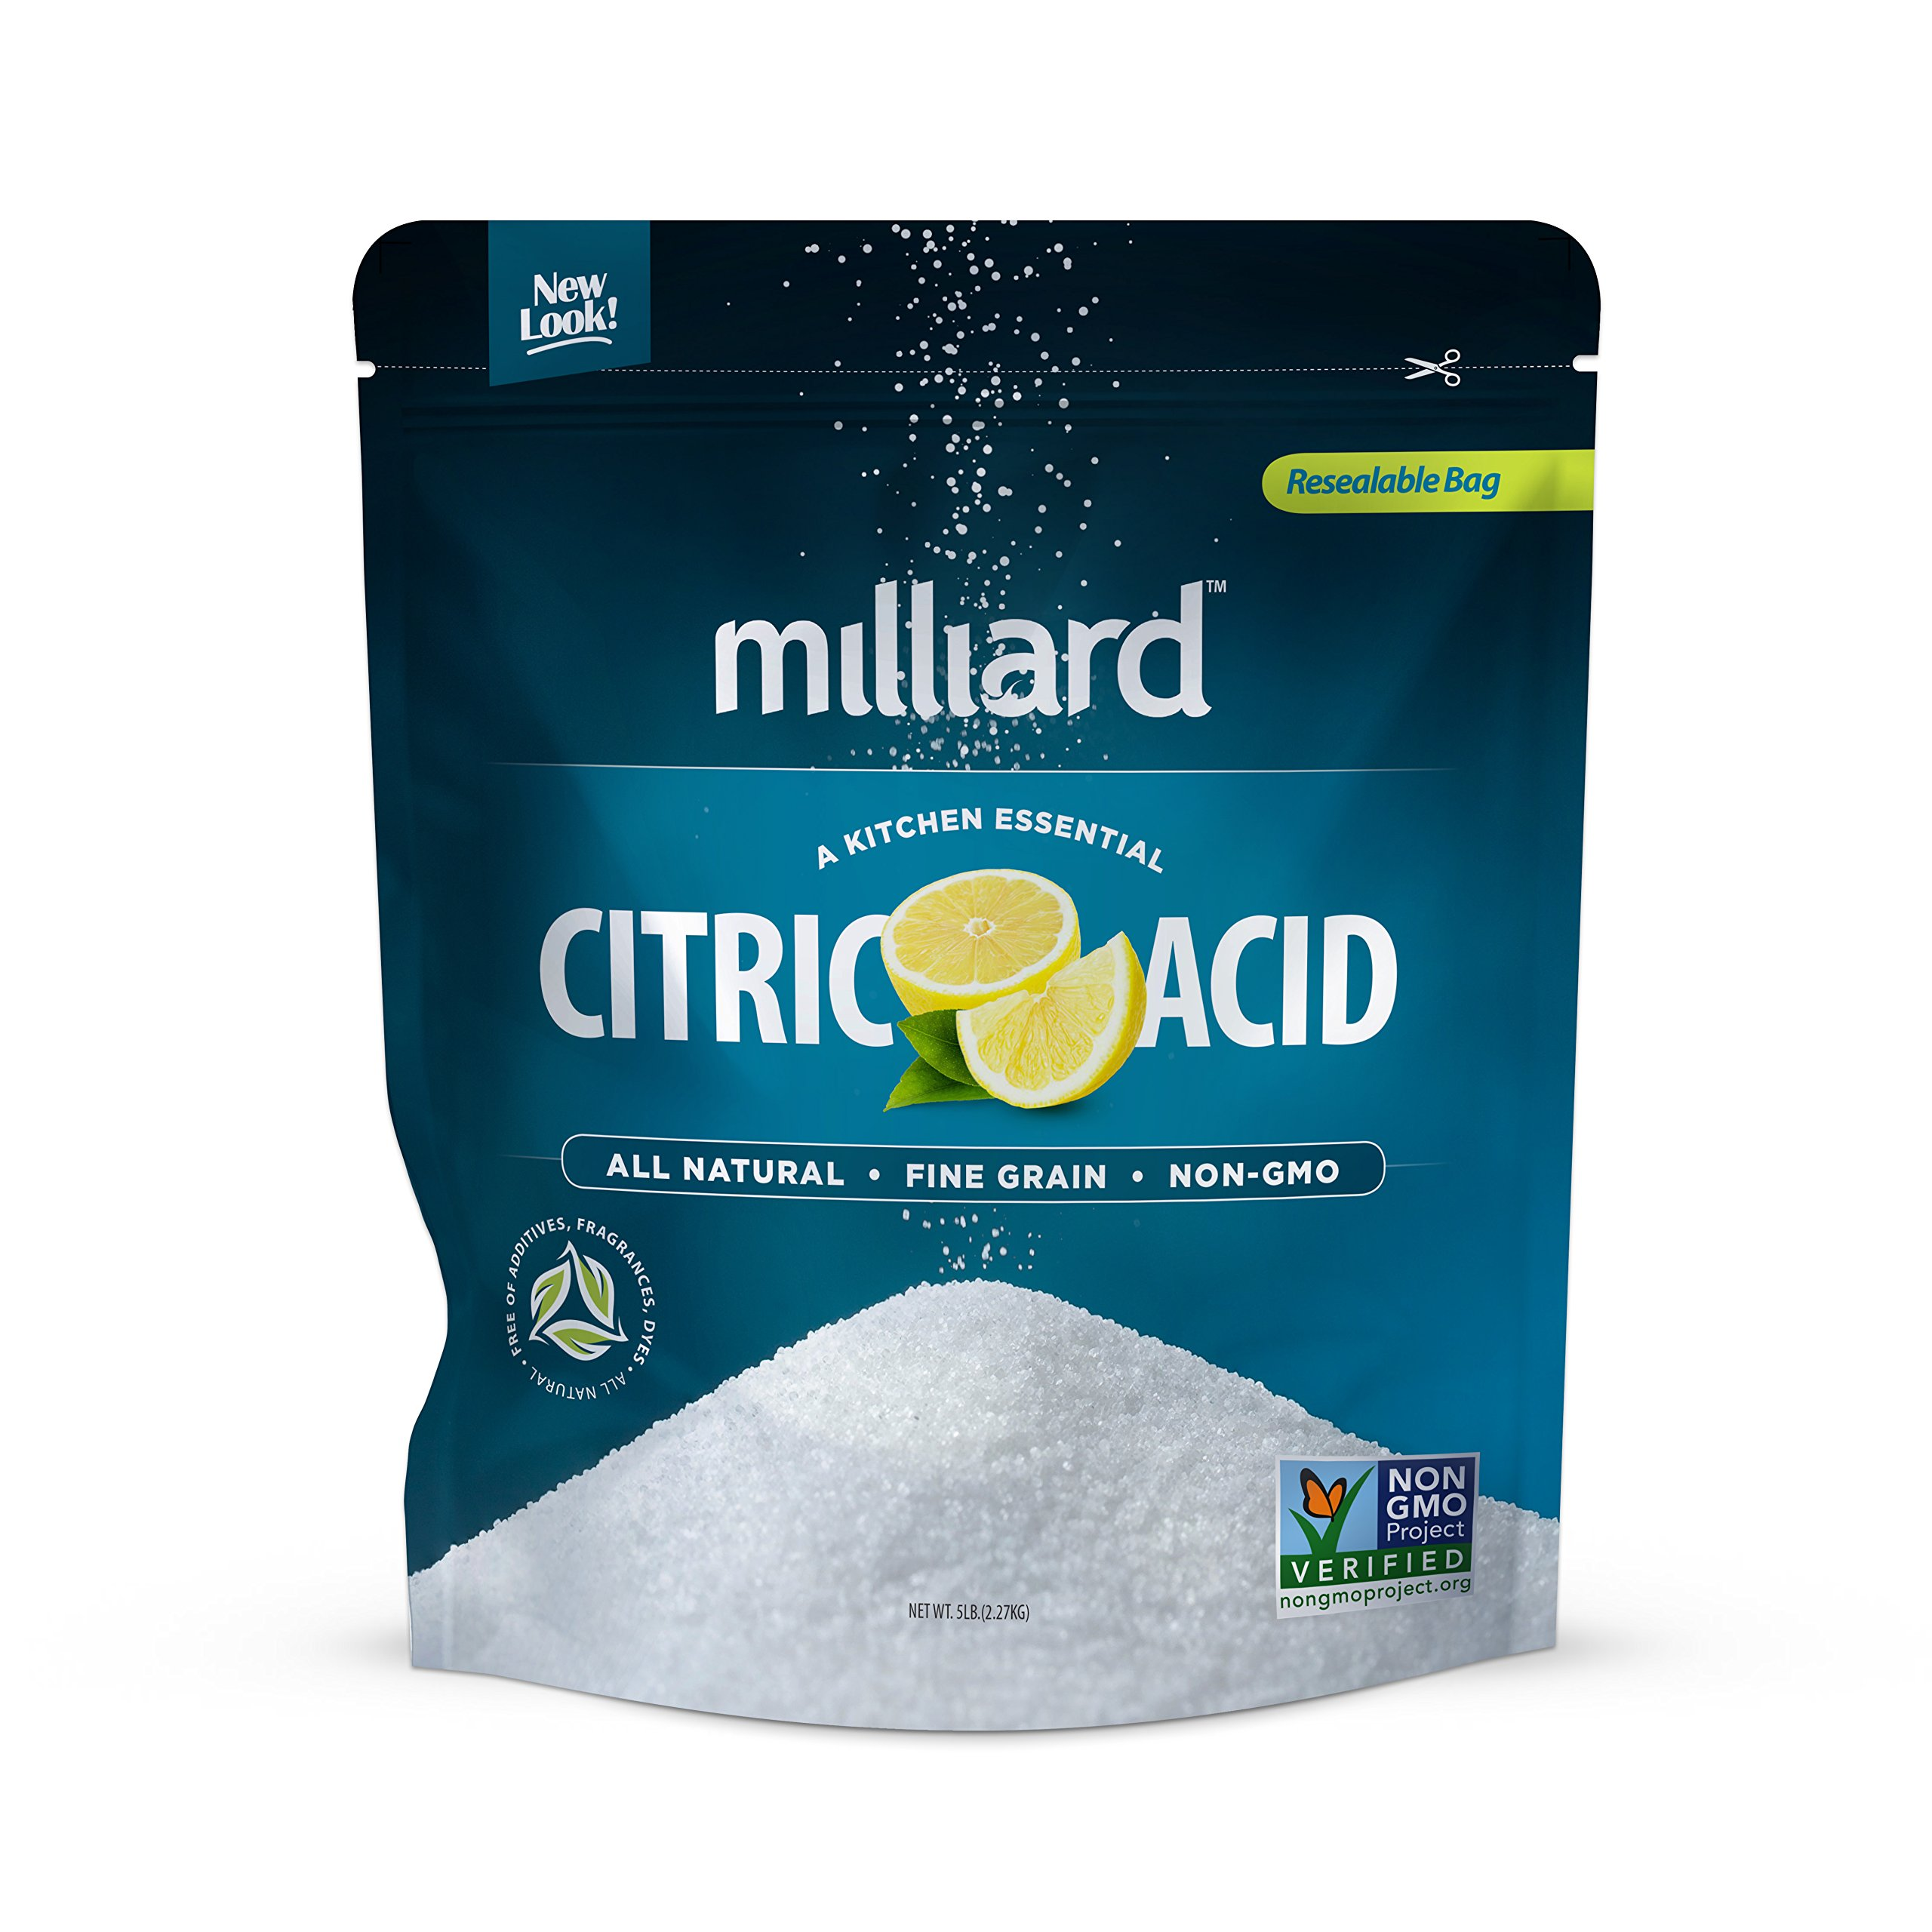 Milliard Citric Acid 5 Pound - 100% Pure Food Grade NON-GMO Project VERIFIED (5 Pound) by Milliard